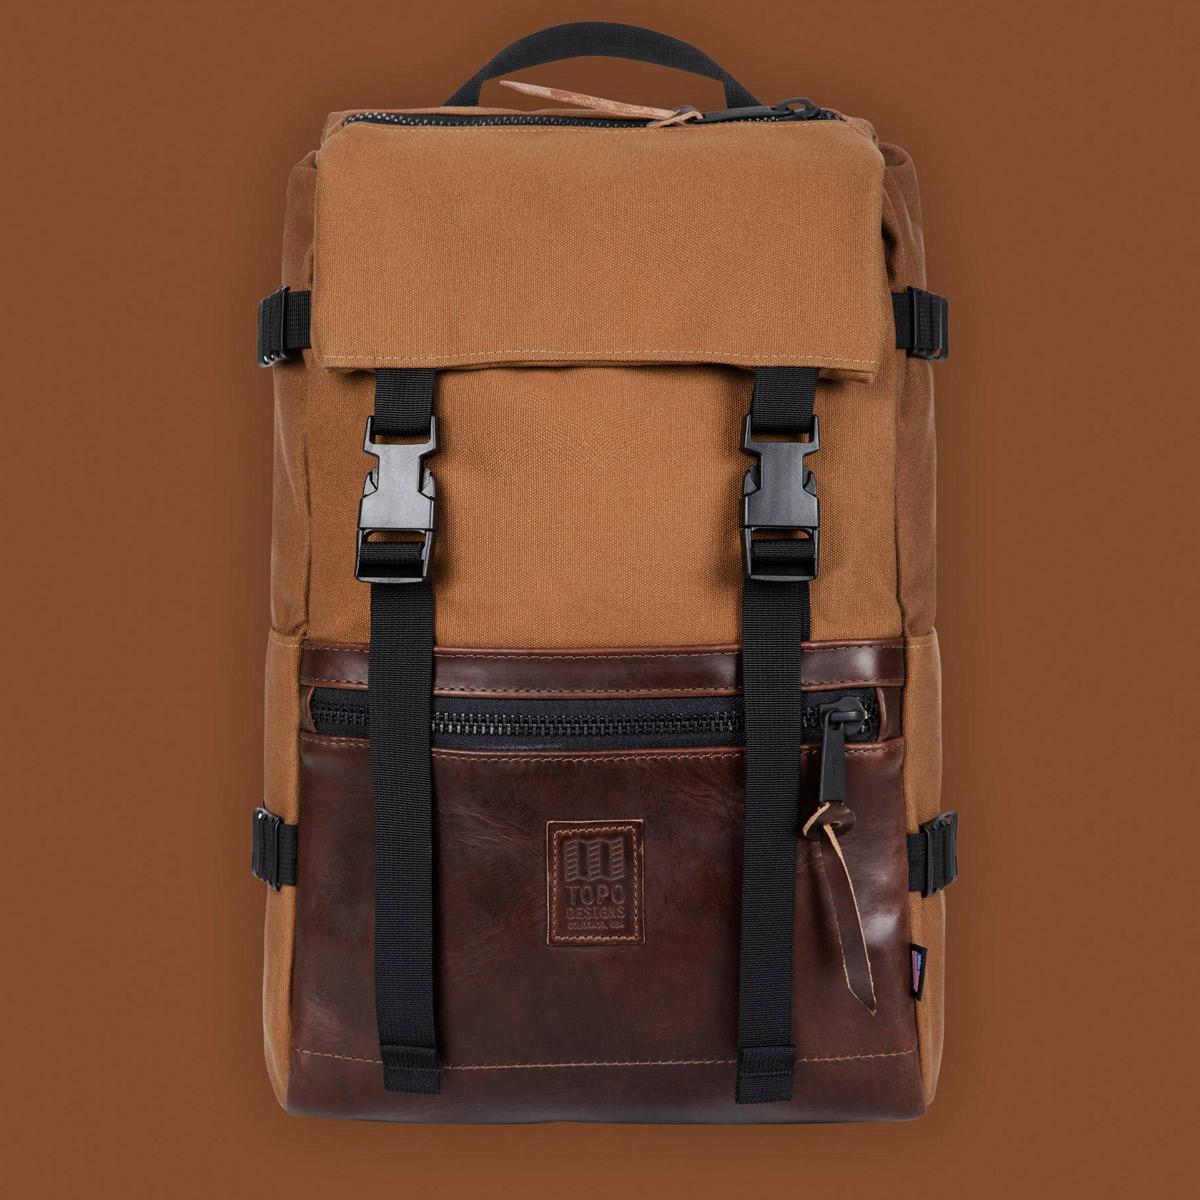 Topo Designs Rover Pack Heritage Dark Khaki Canvas/Brown Leather, klassieke en tijdloze rugzak